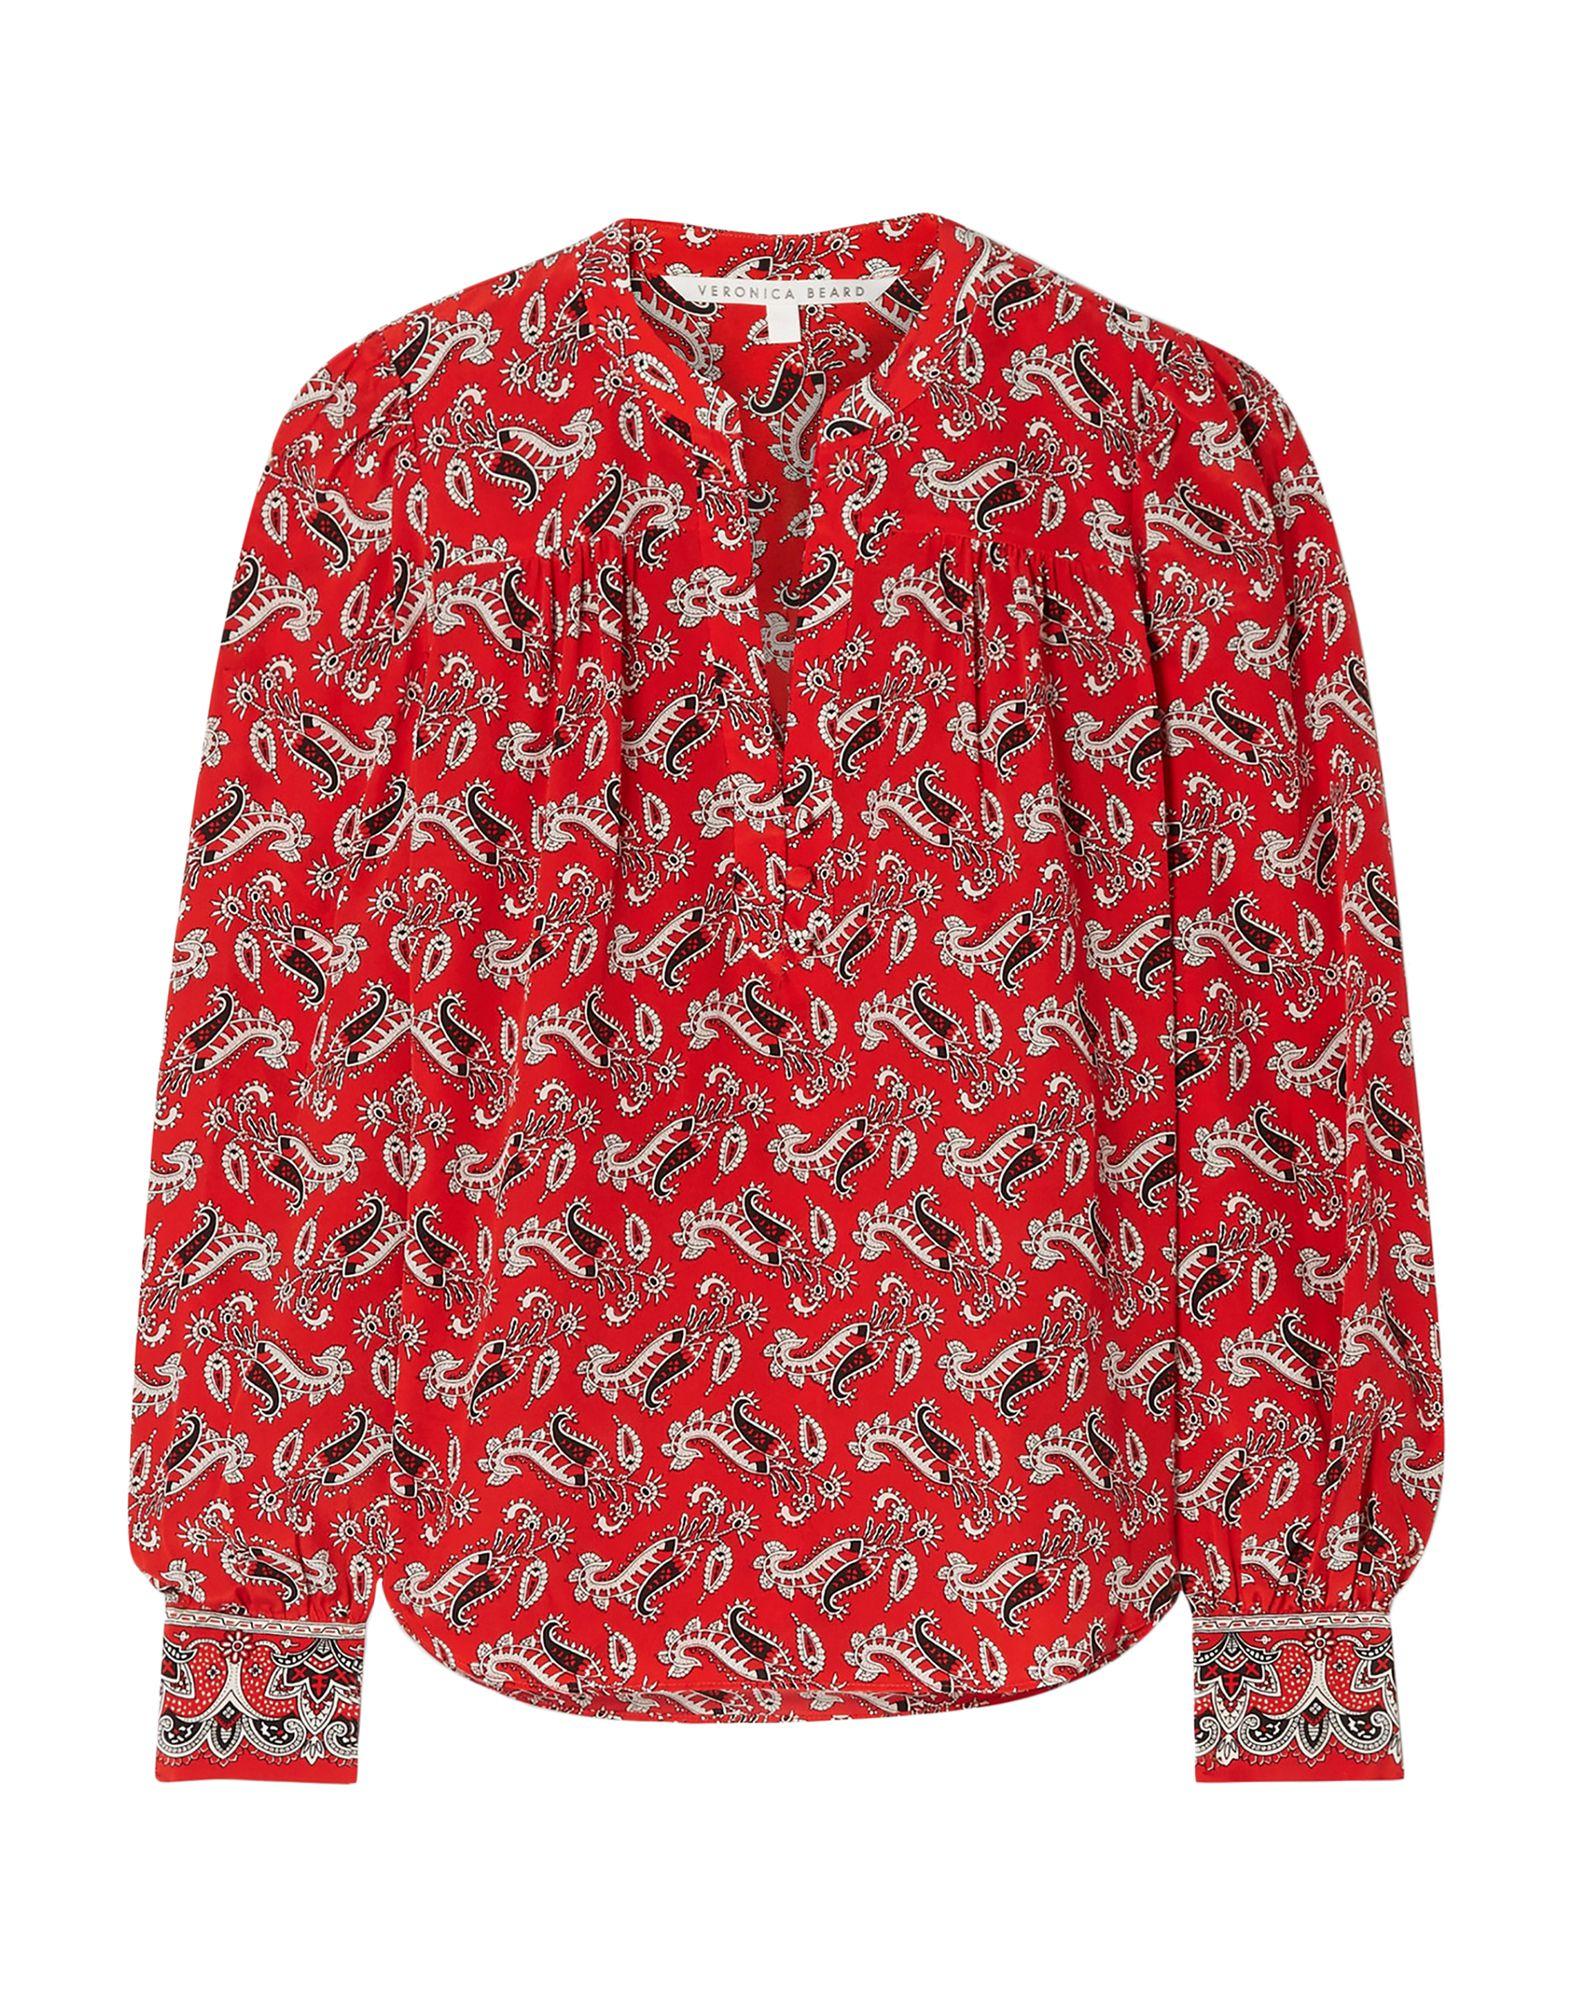 VERONICA BEARD Blouses. crepe, no appliqués, paisley-print, front closure, button closing, long sleeves, buttoned cuffs, v-neck, no pockets. 100% Silk